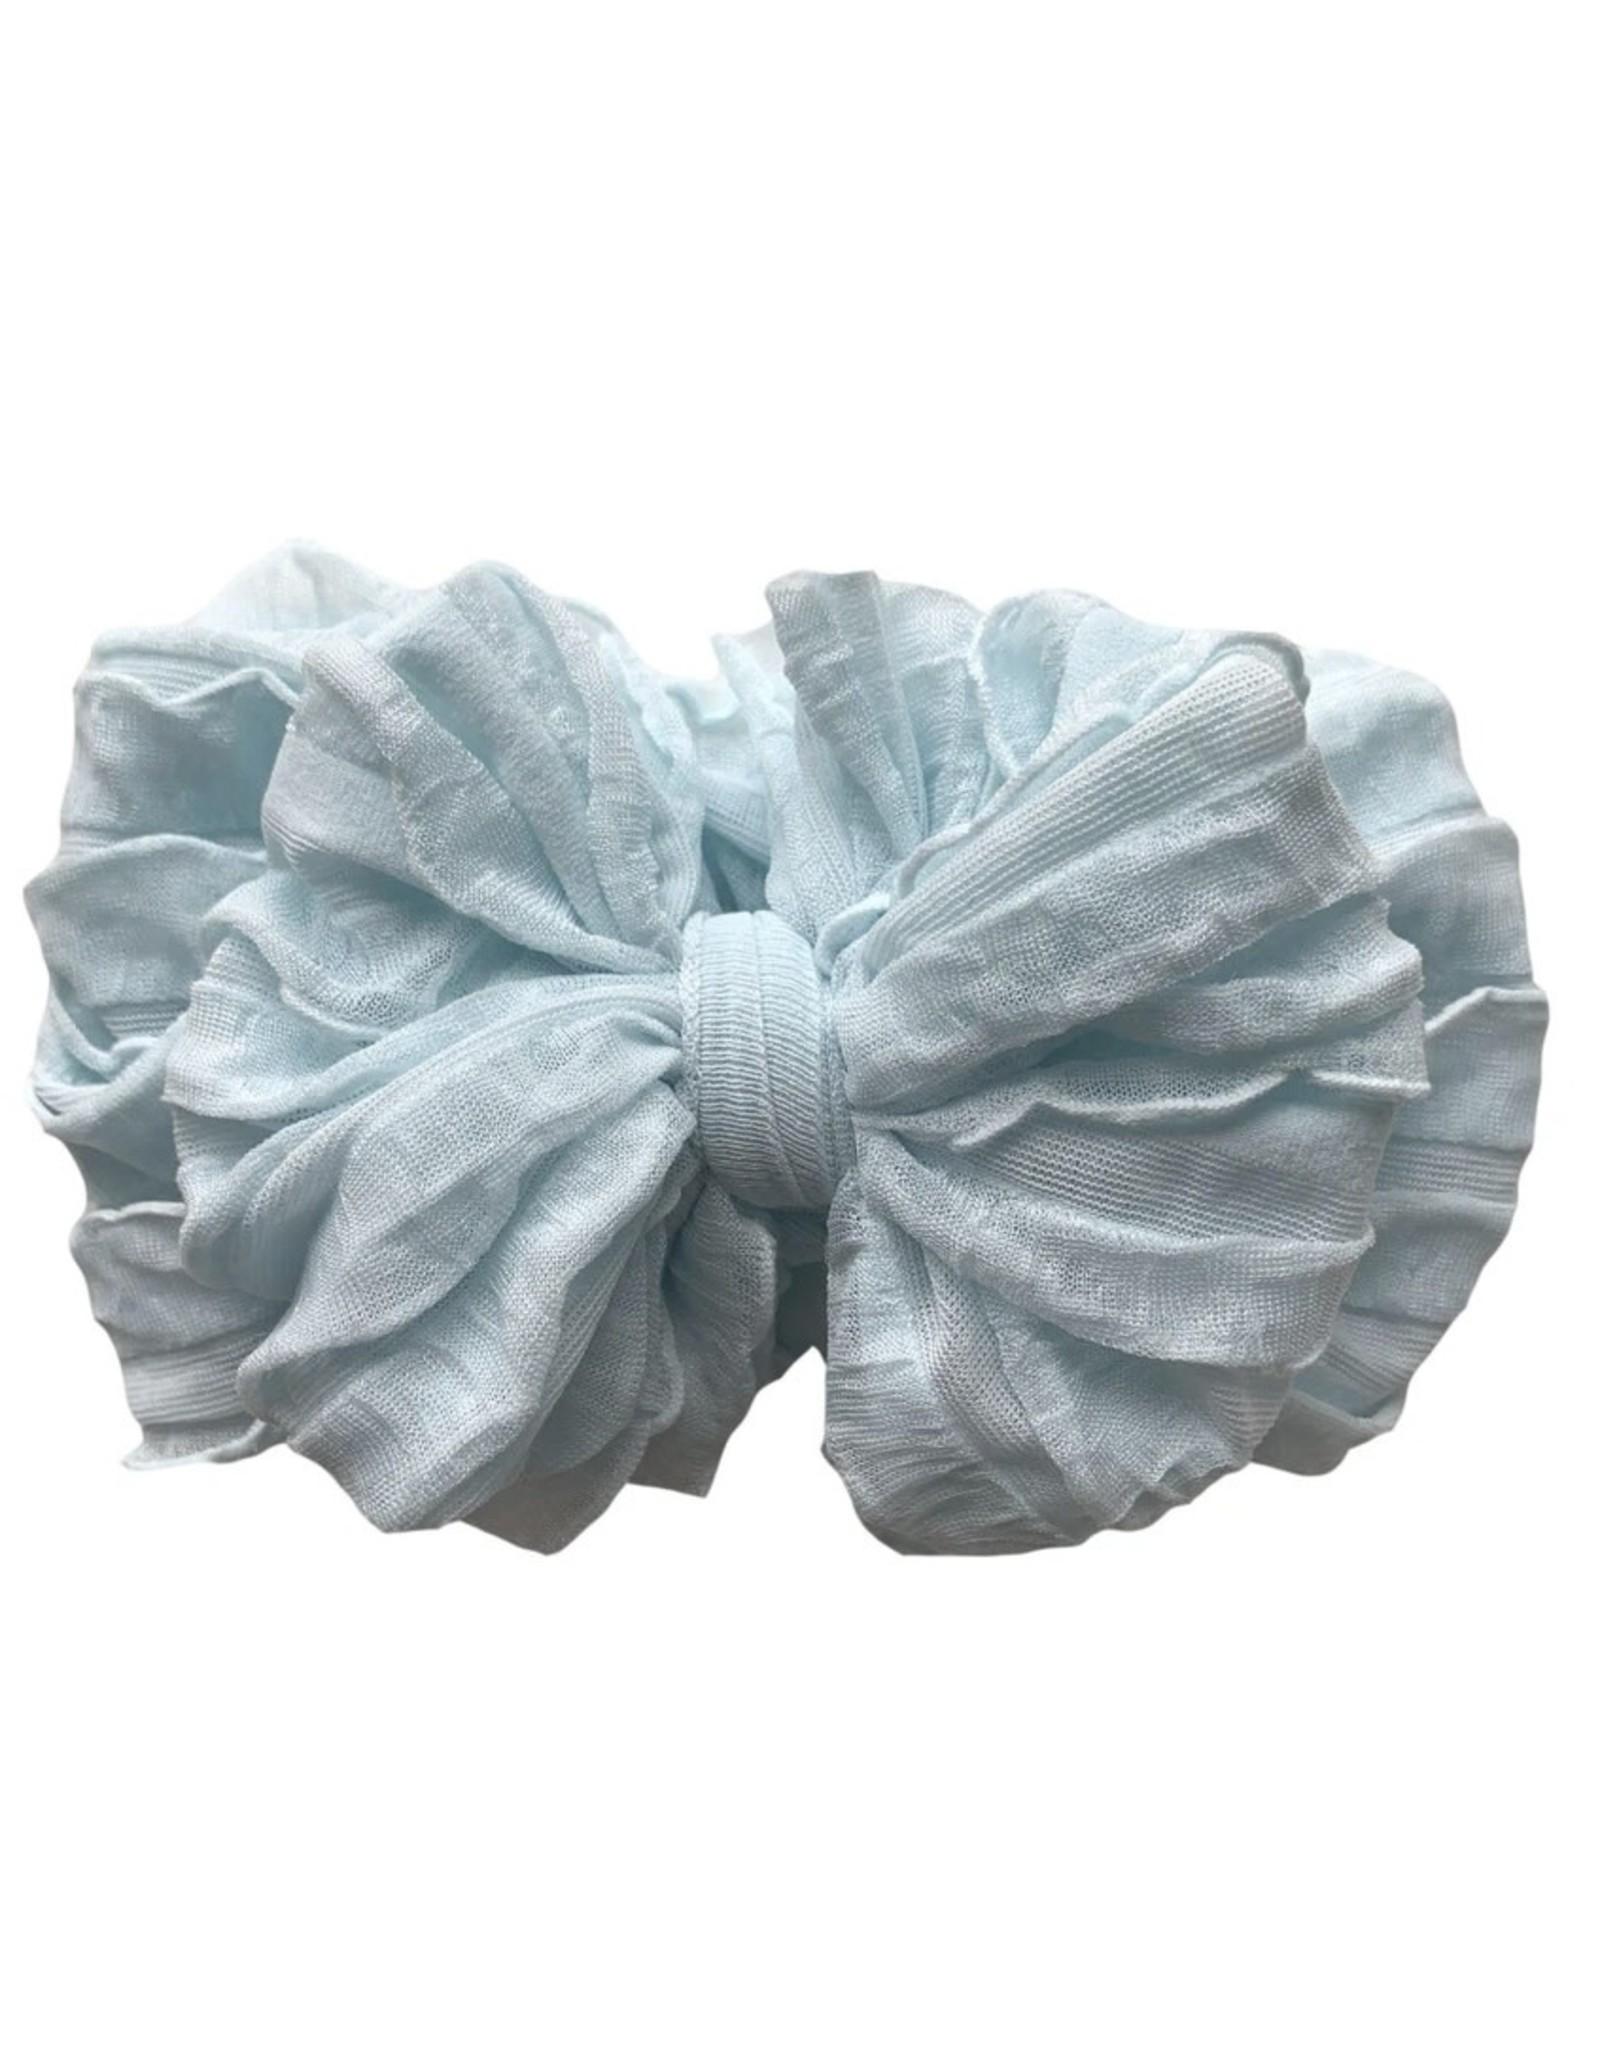 In Awe- Sky Blue Headband